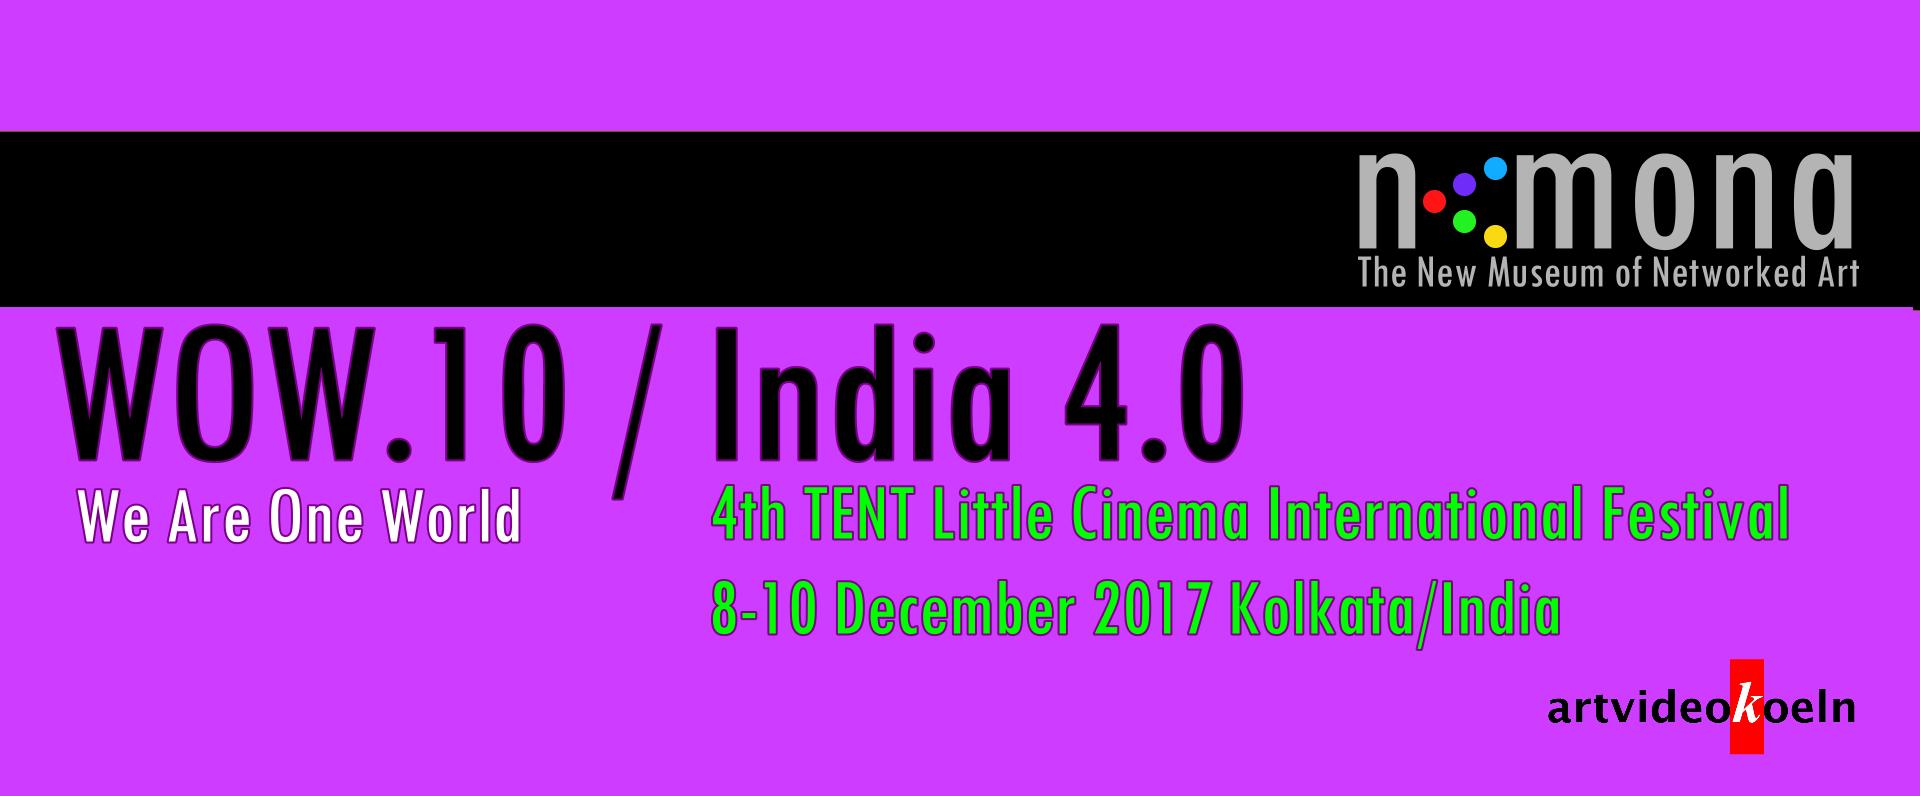 WOW.10 / India 4.0